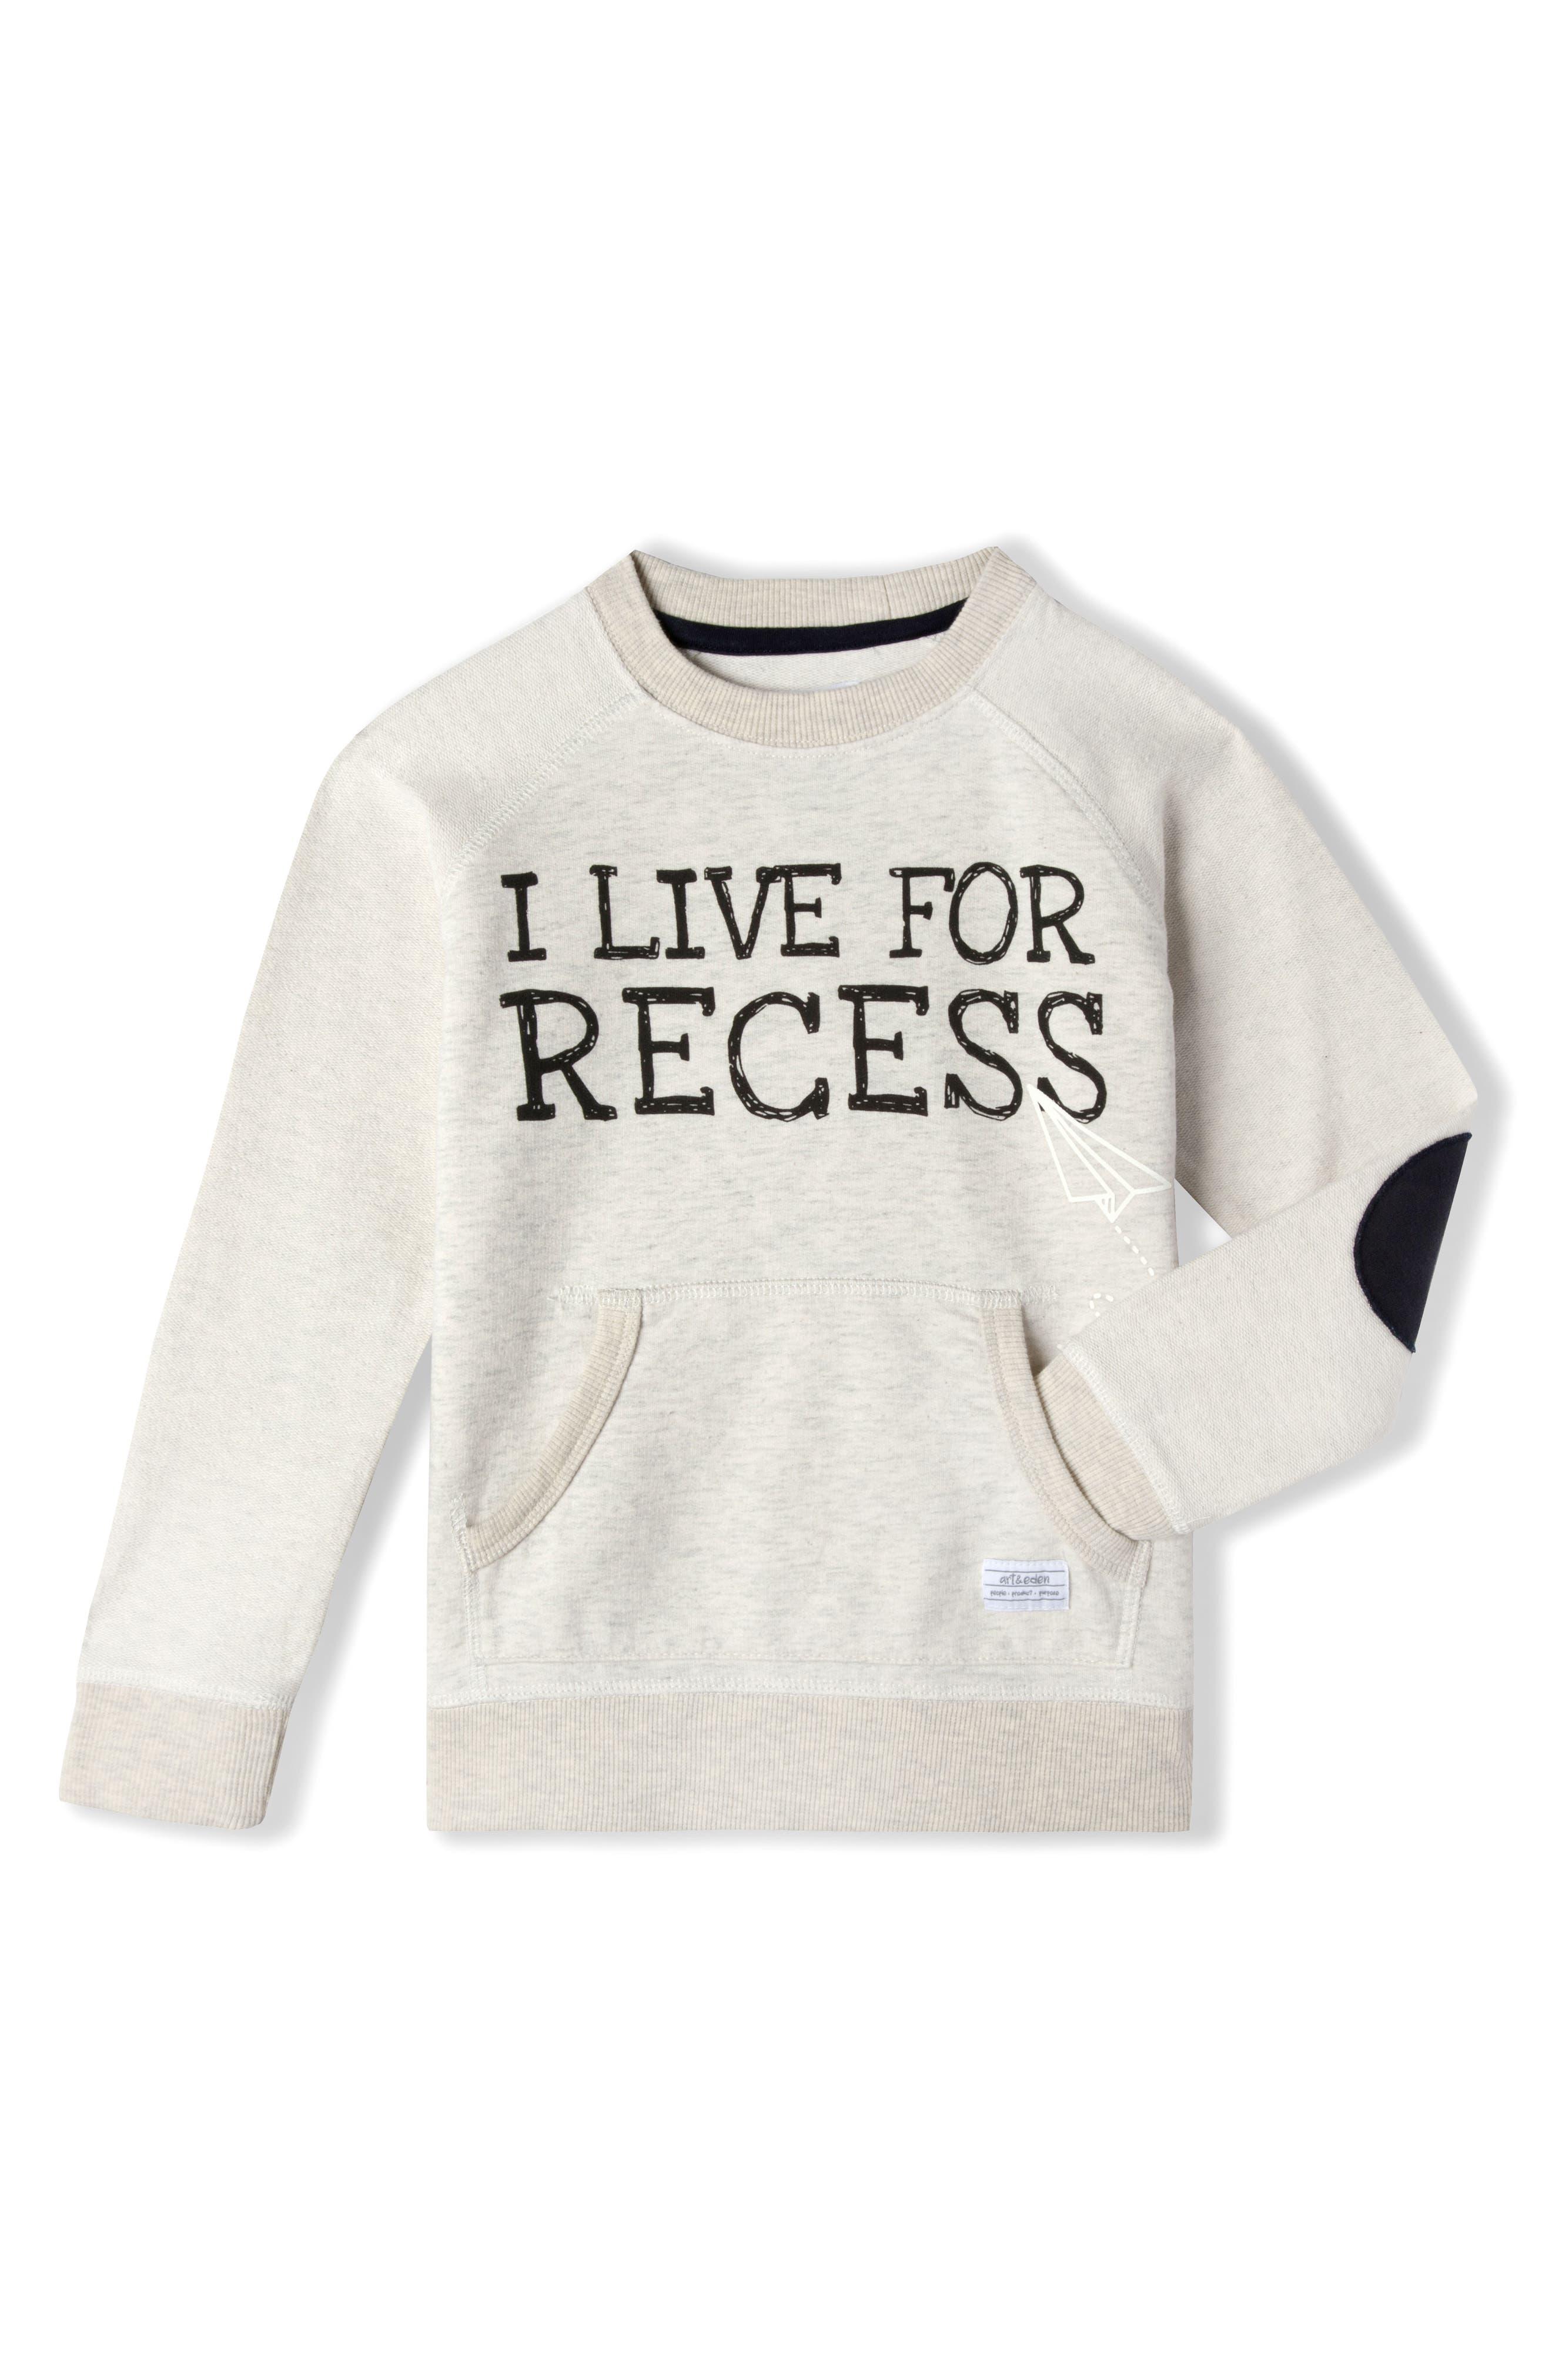 Recess Organic Cotton Sweatshirt,                             Main thumbnail 1, color,                             903